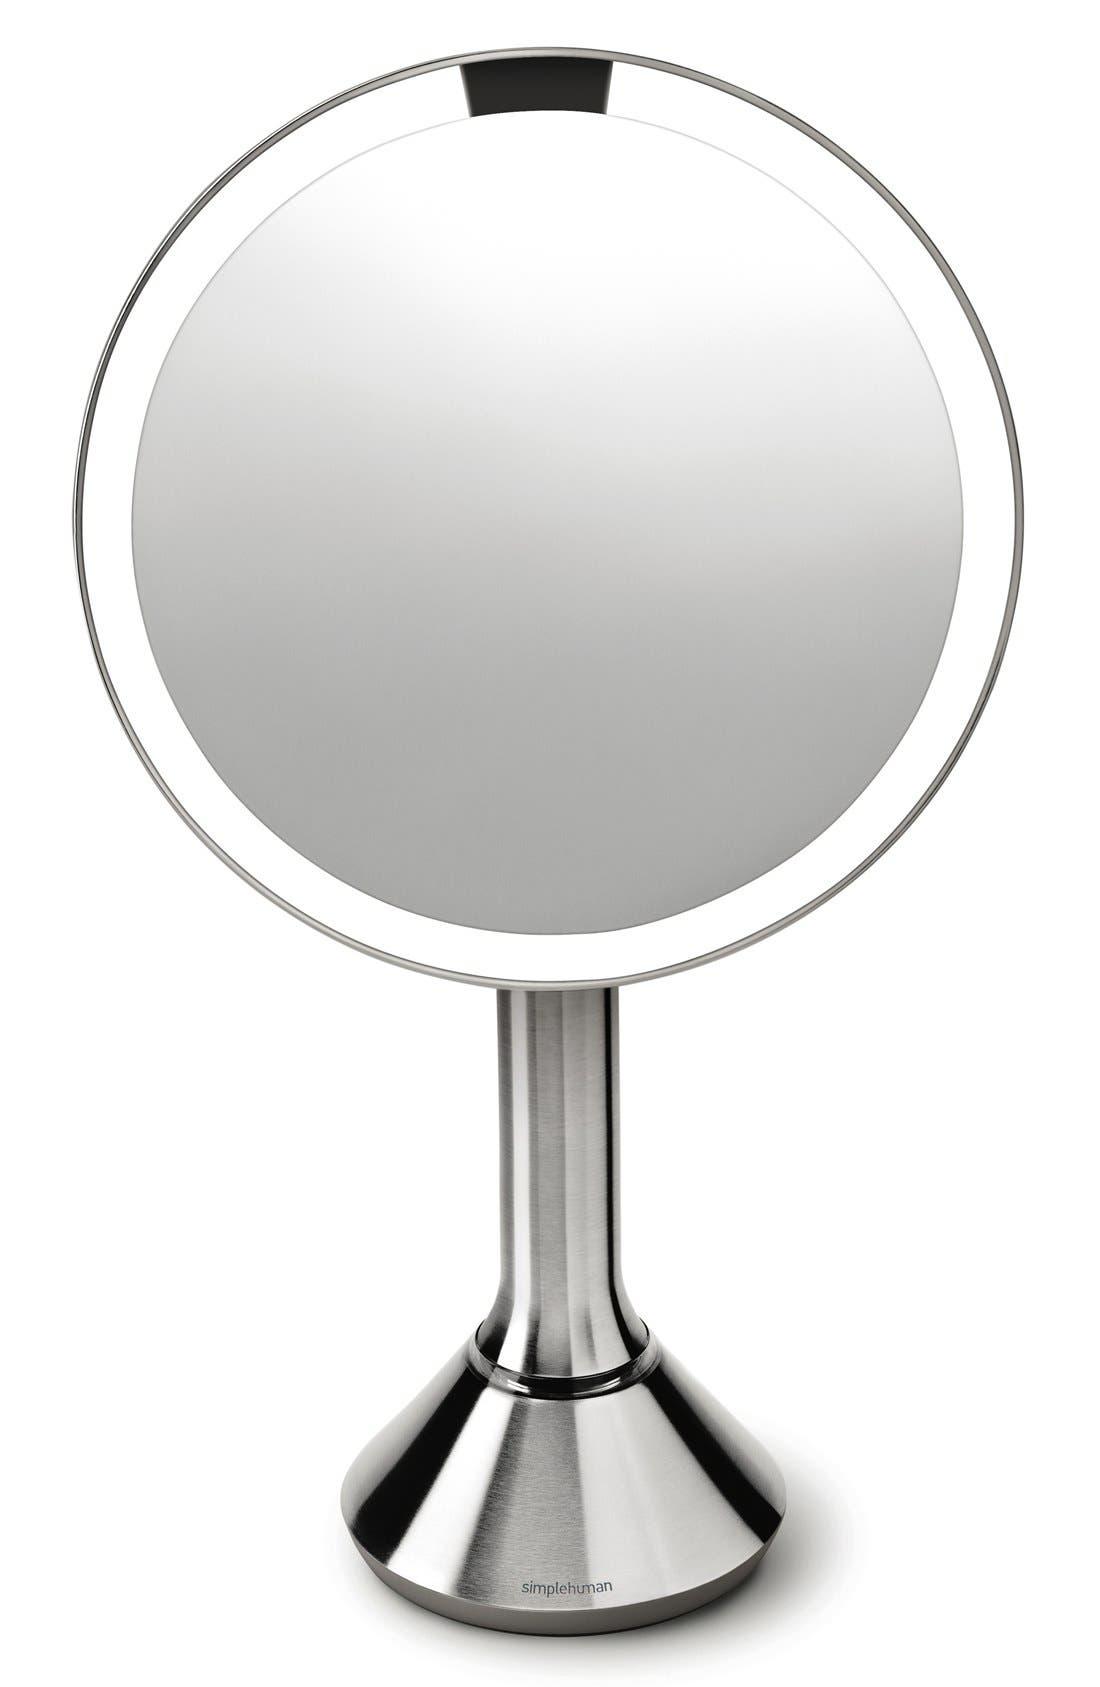 Alternate Image 3  - simplehuman Countertop Sensor Makeup Mirror (8 Inch)